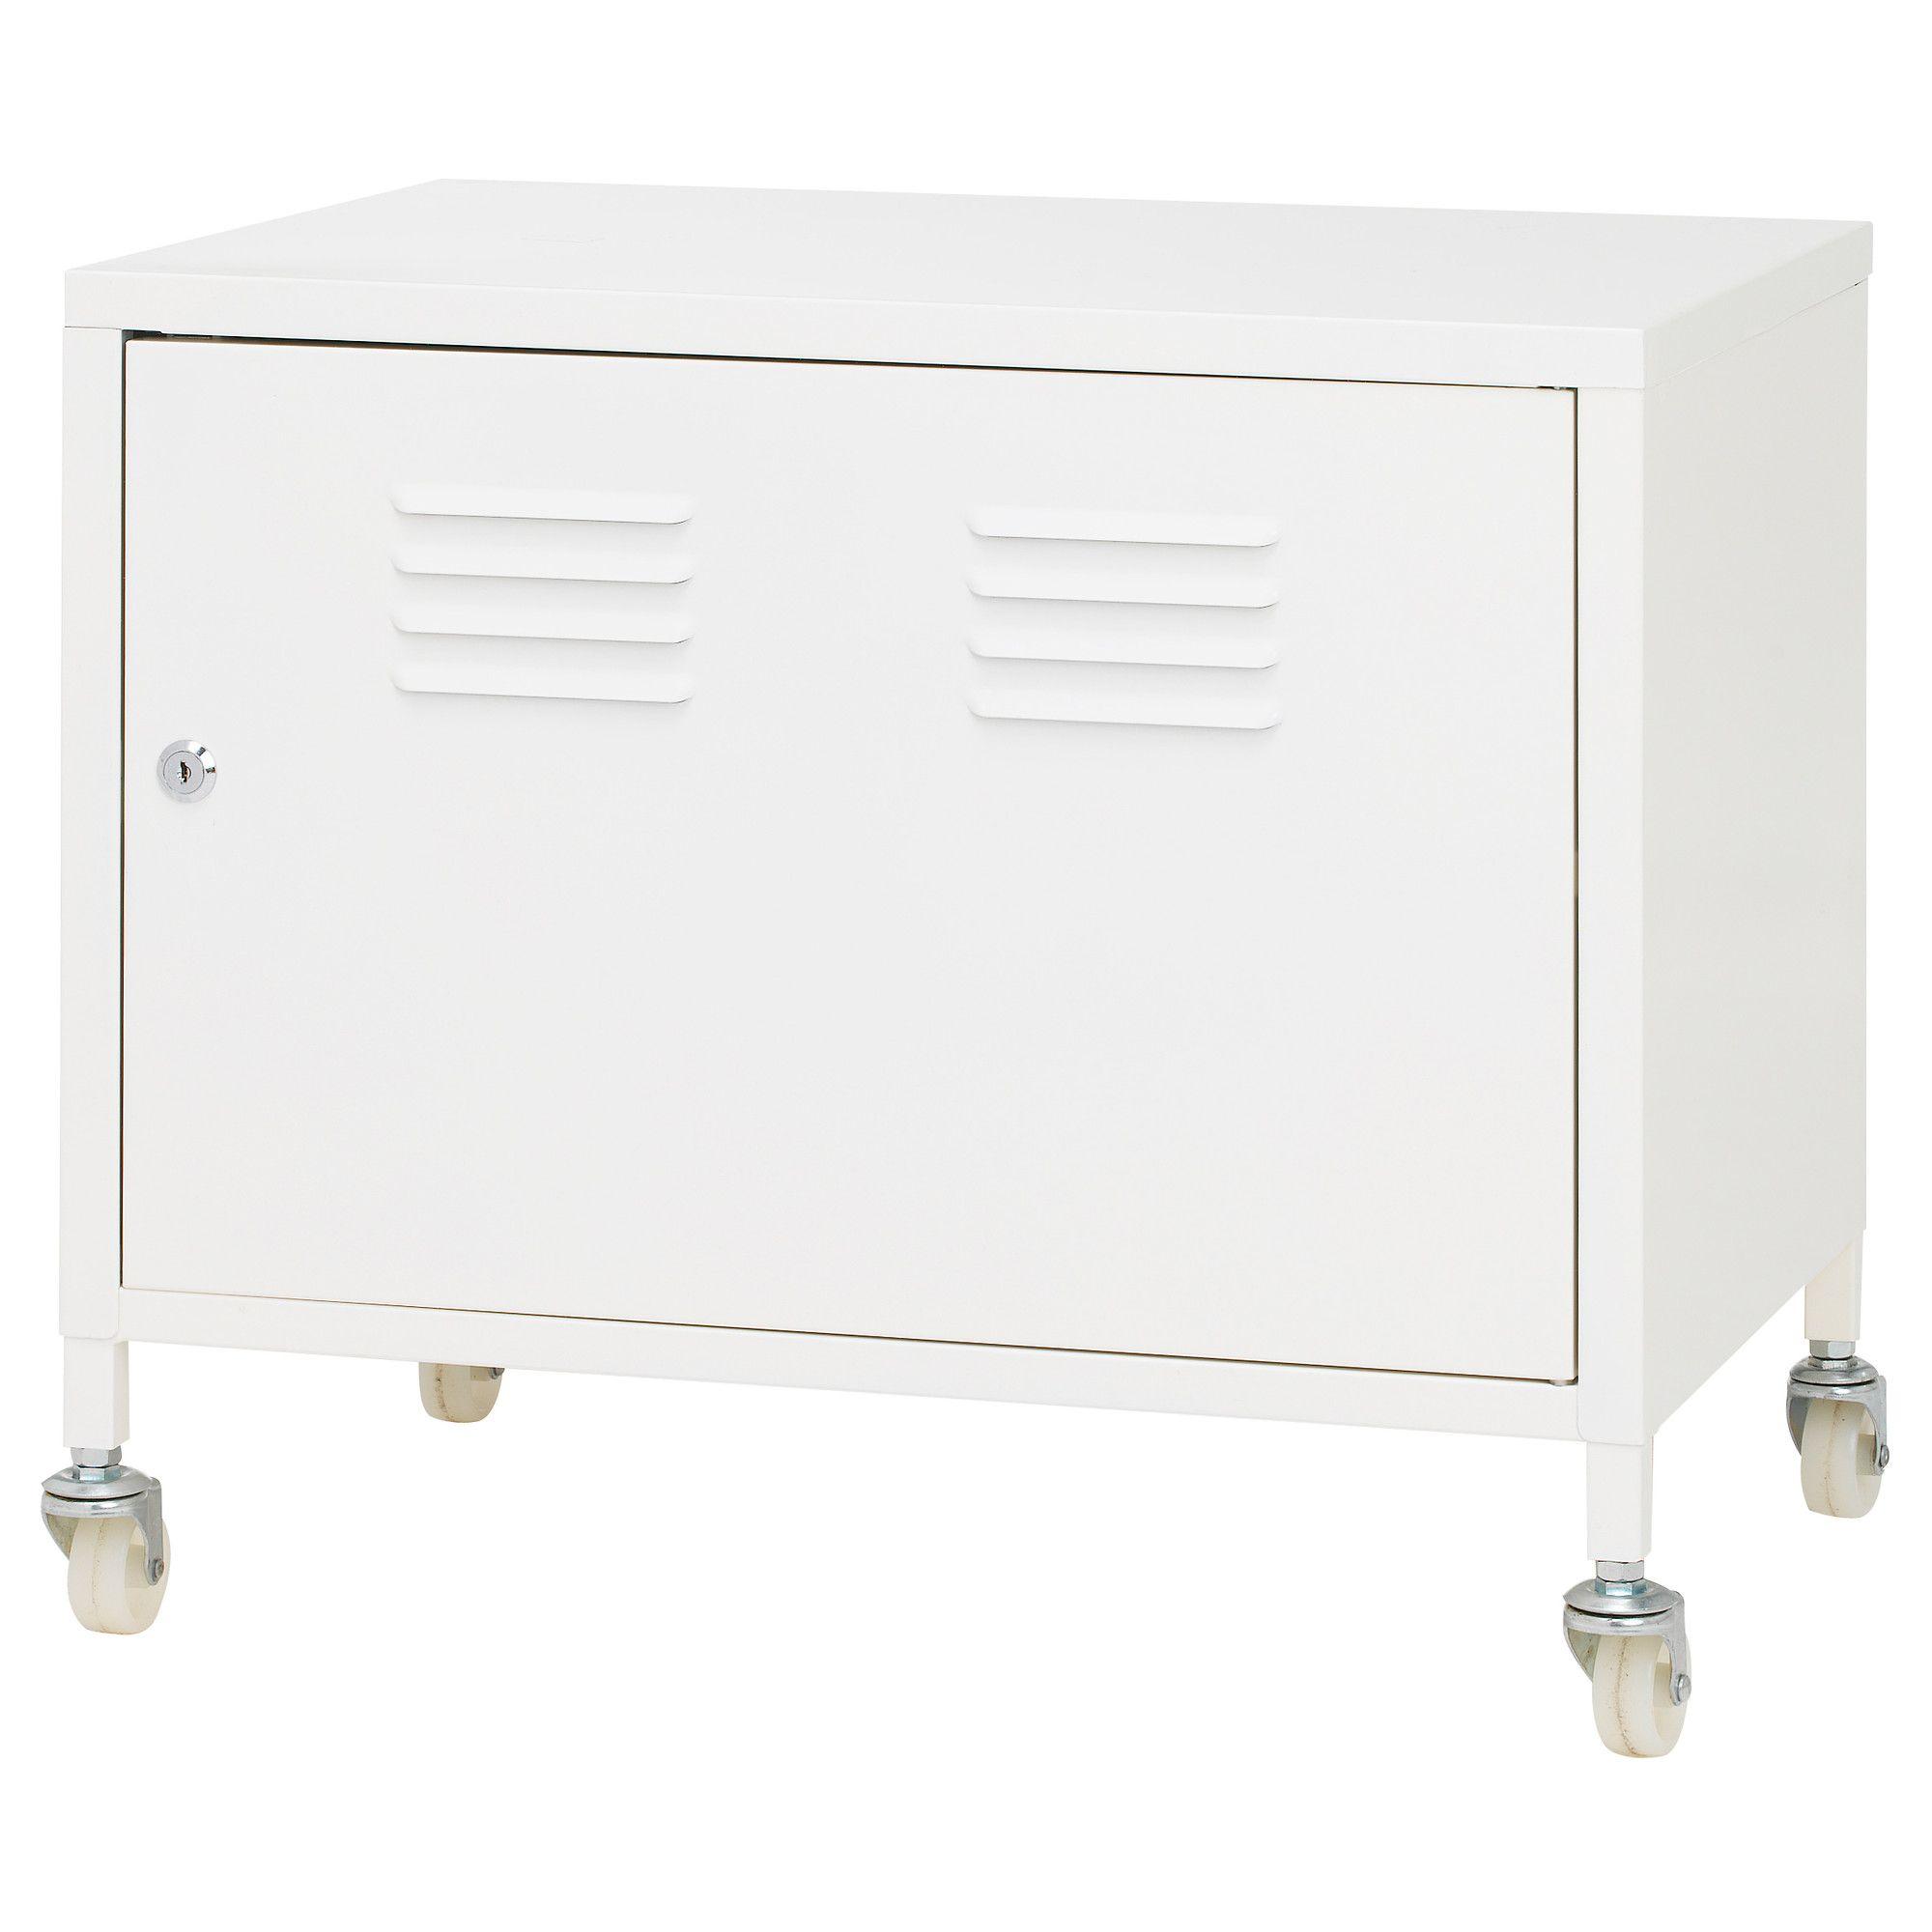 Ikea ps armario con ruedas ikea furniture pinterest - Ikea ps armario ...